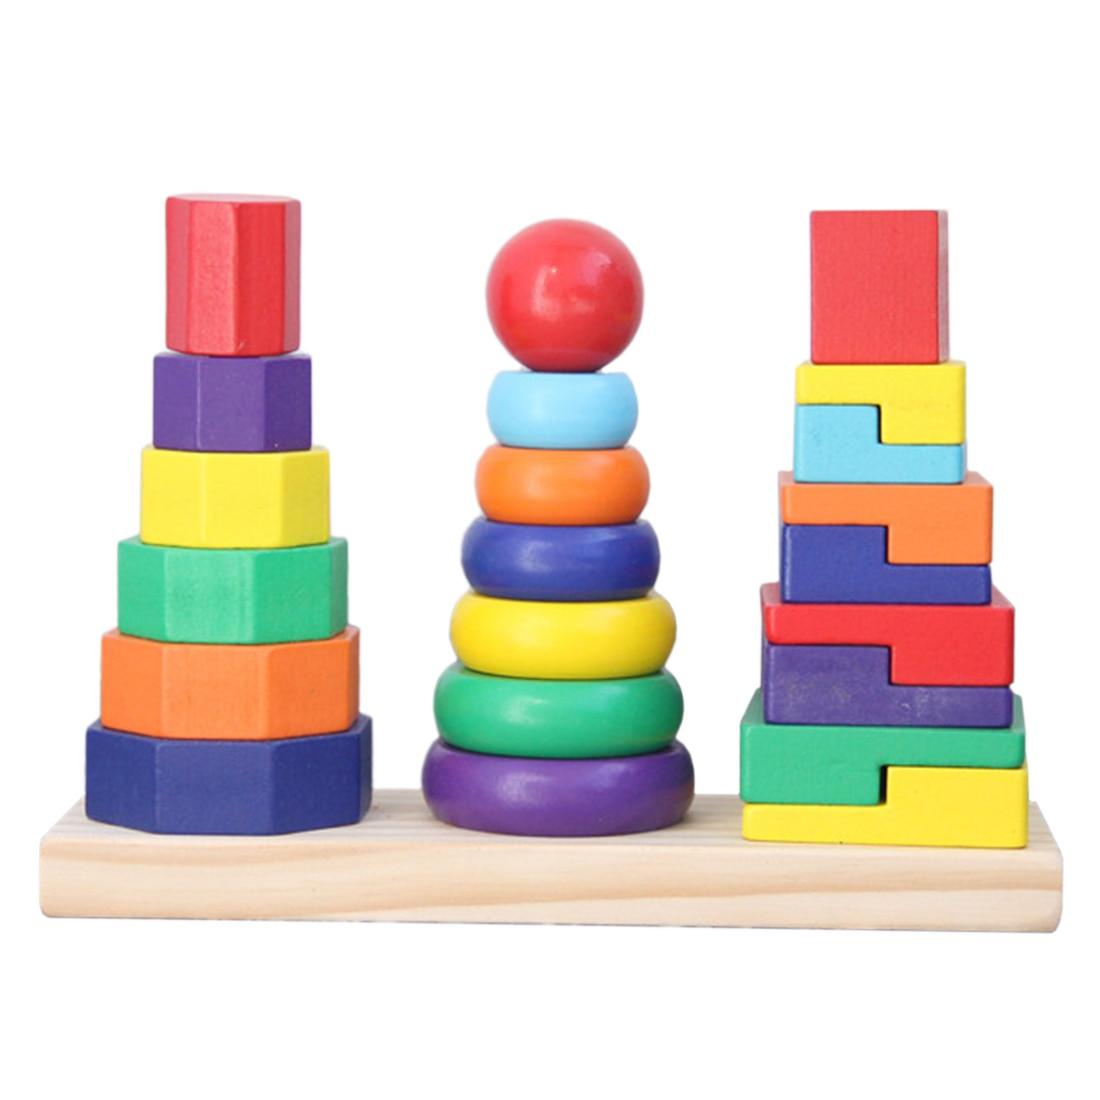 3 columnas, bloques geométricos de madera, Color de Torre apilable y forma de juguete cognitivo para niños, bloques de madera para regalo de niños